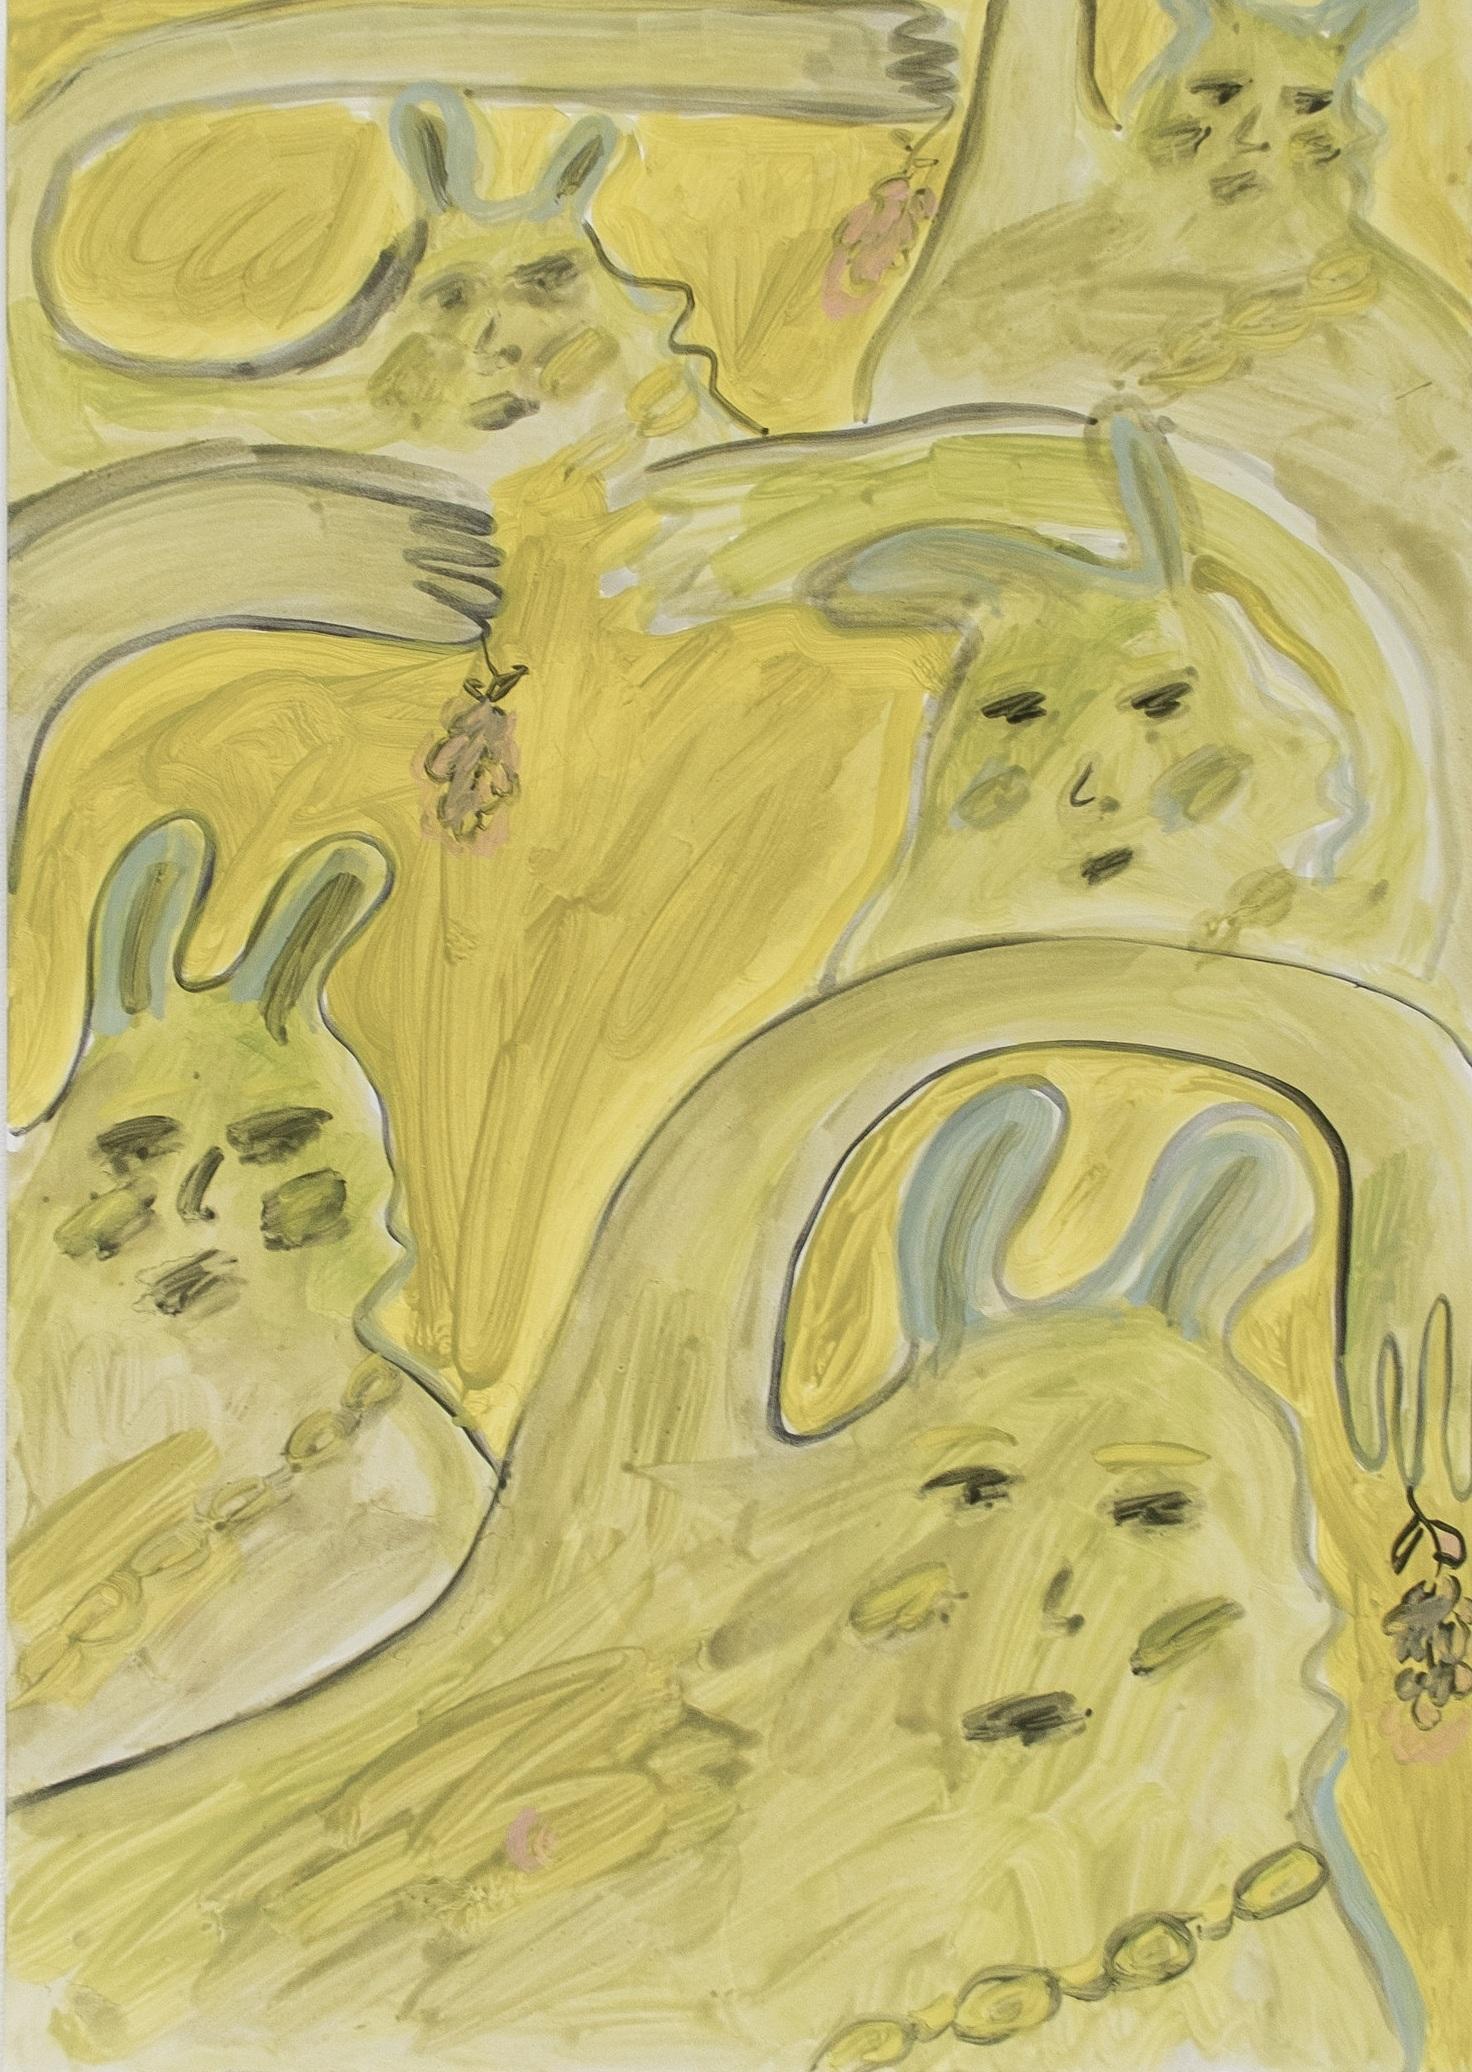 The Little Devils  84 x 60 cm  Oil on Paper